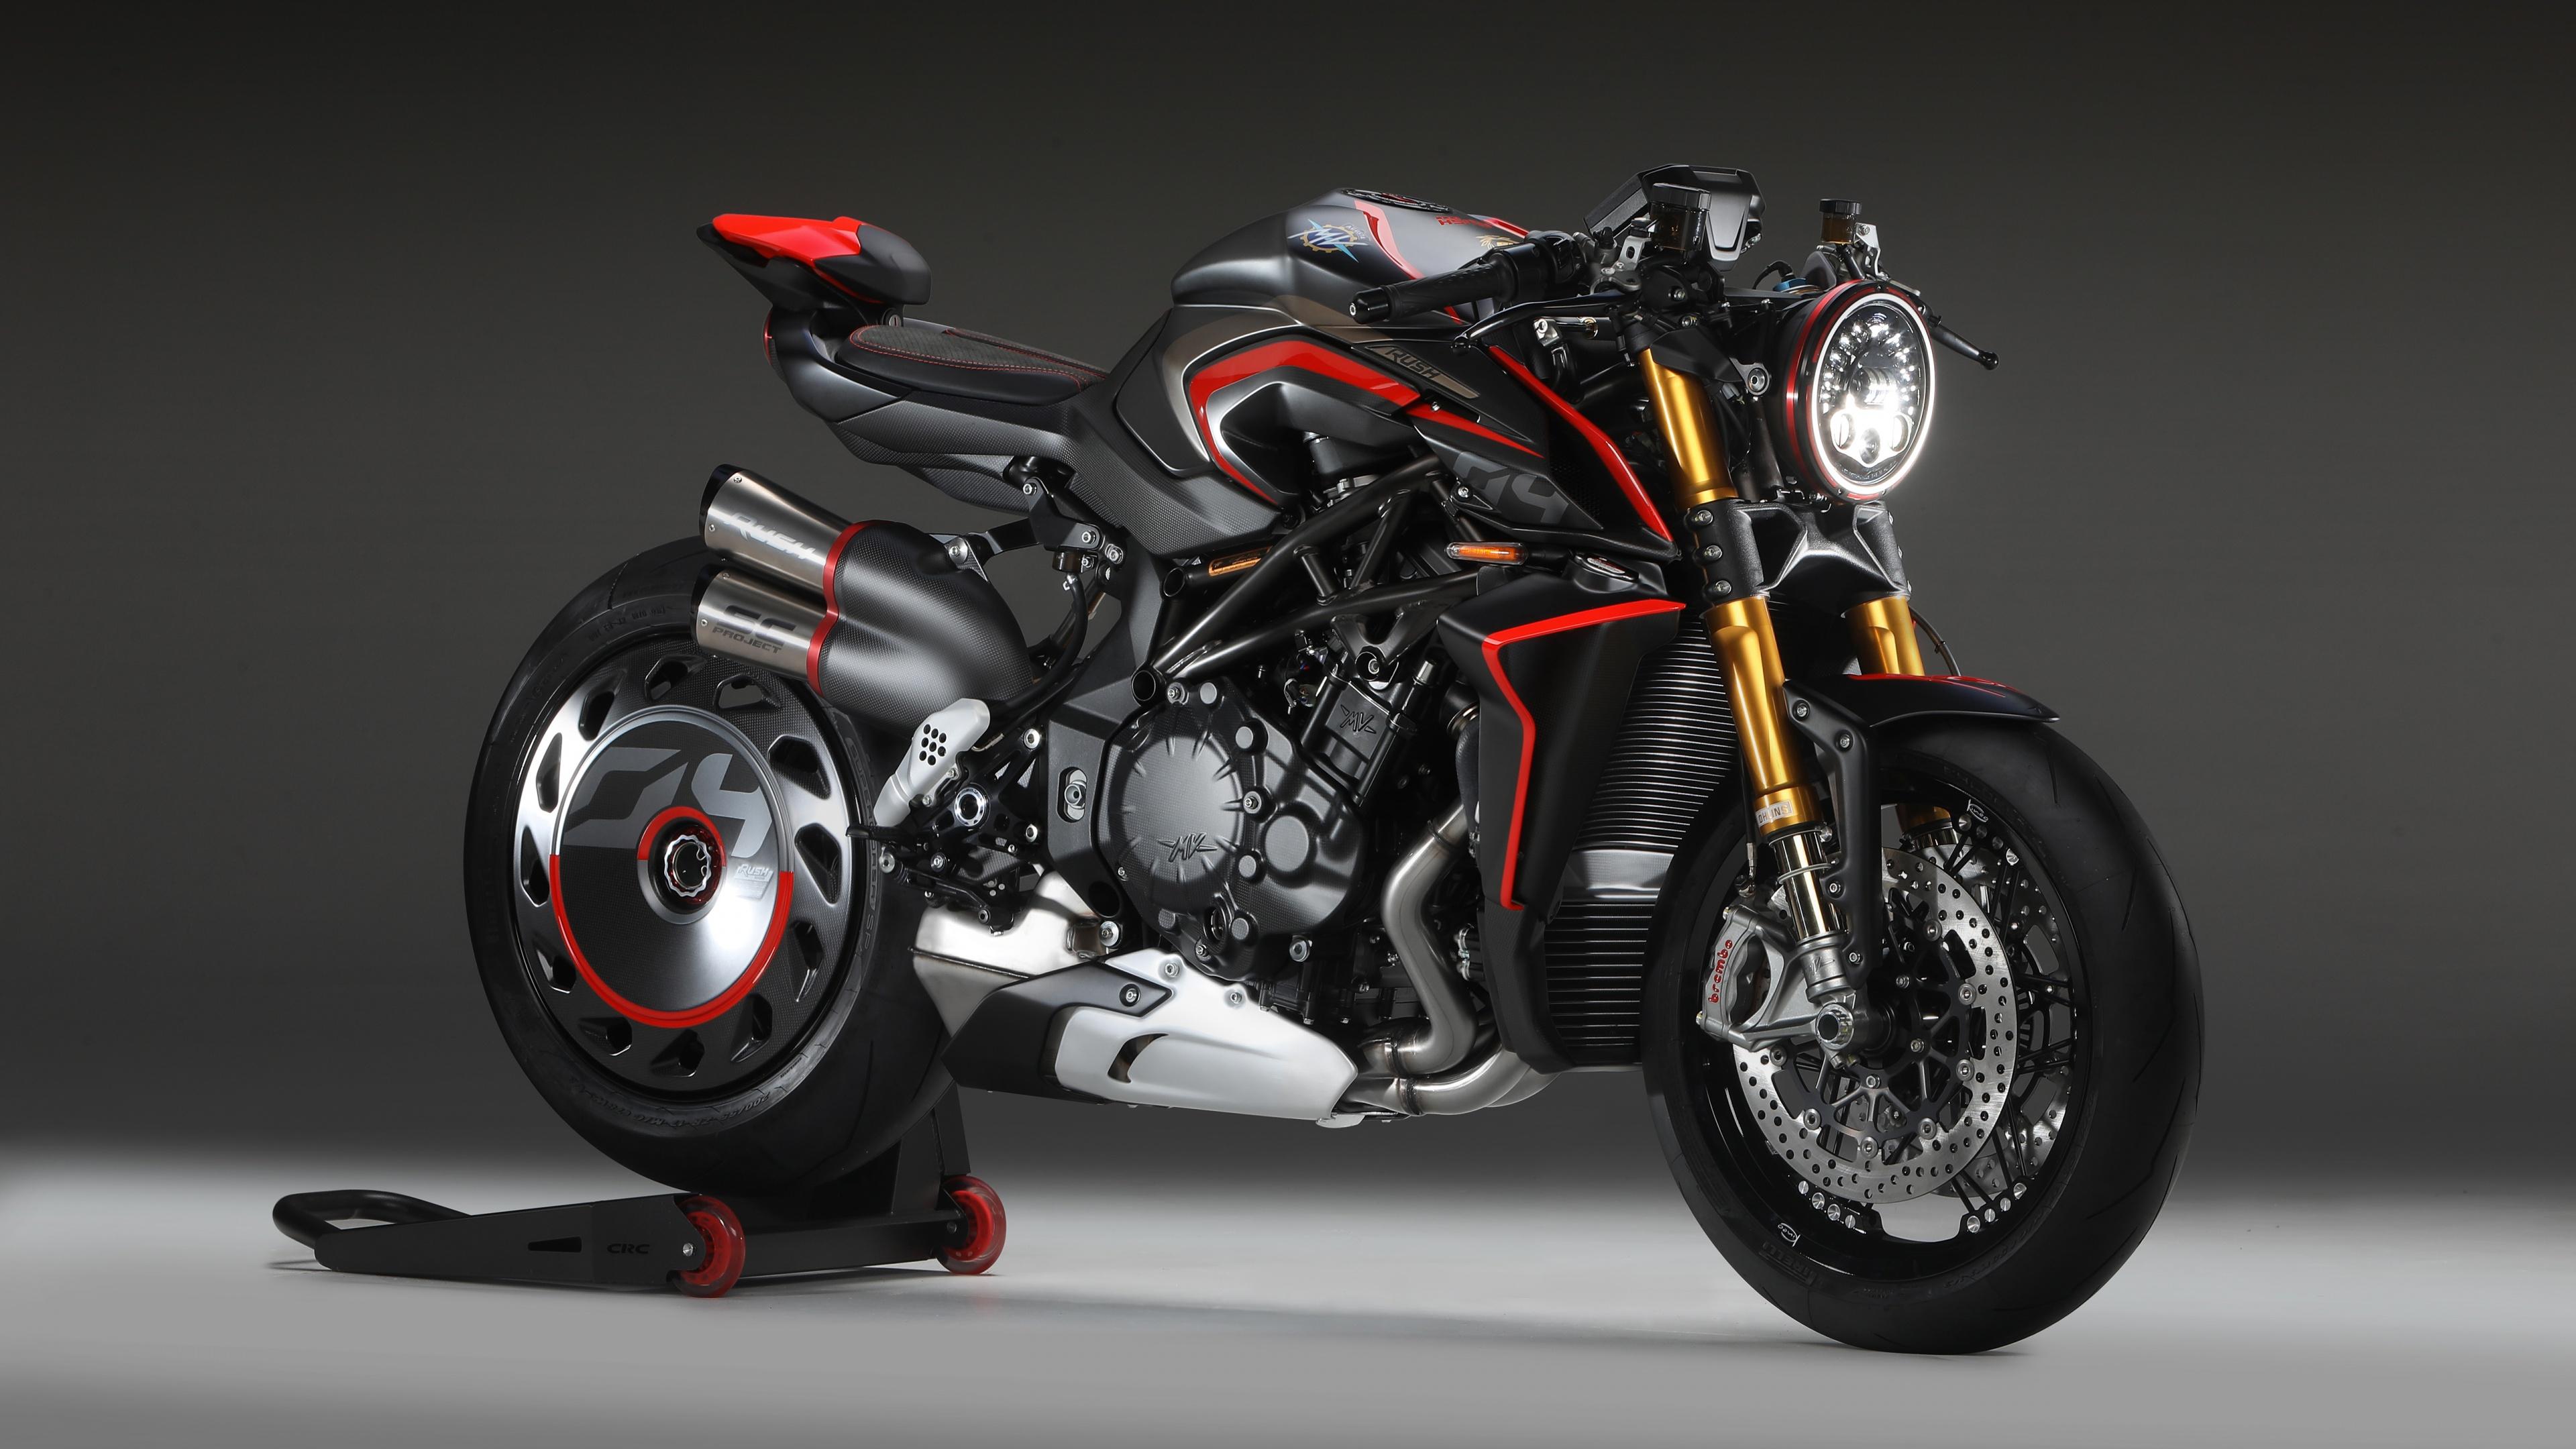 Mv Agusta Rush 1000 Wallpaper 4k 2020 5k Bikes 725 Mv agusta rush 1000 2020 4k